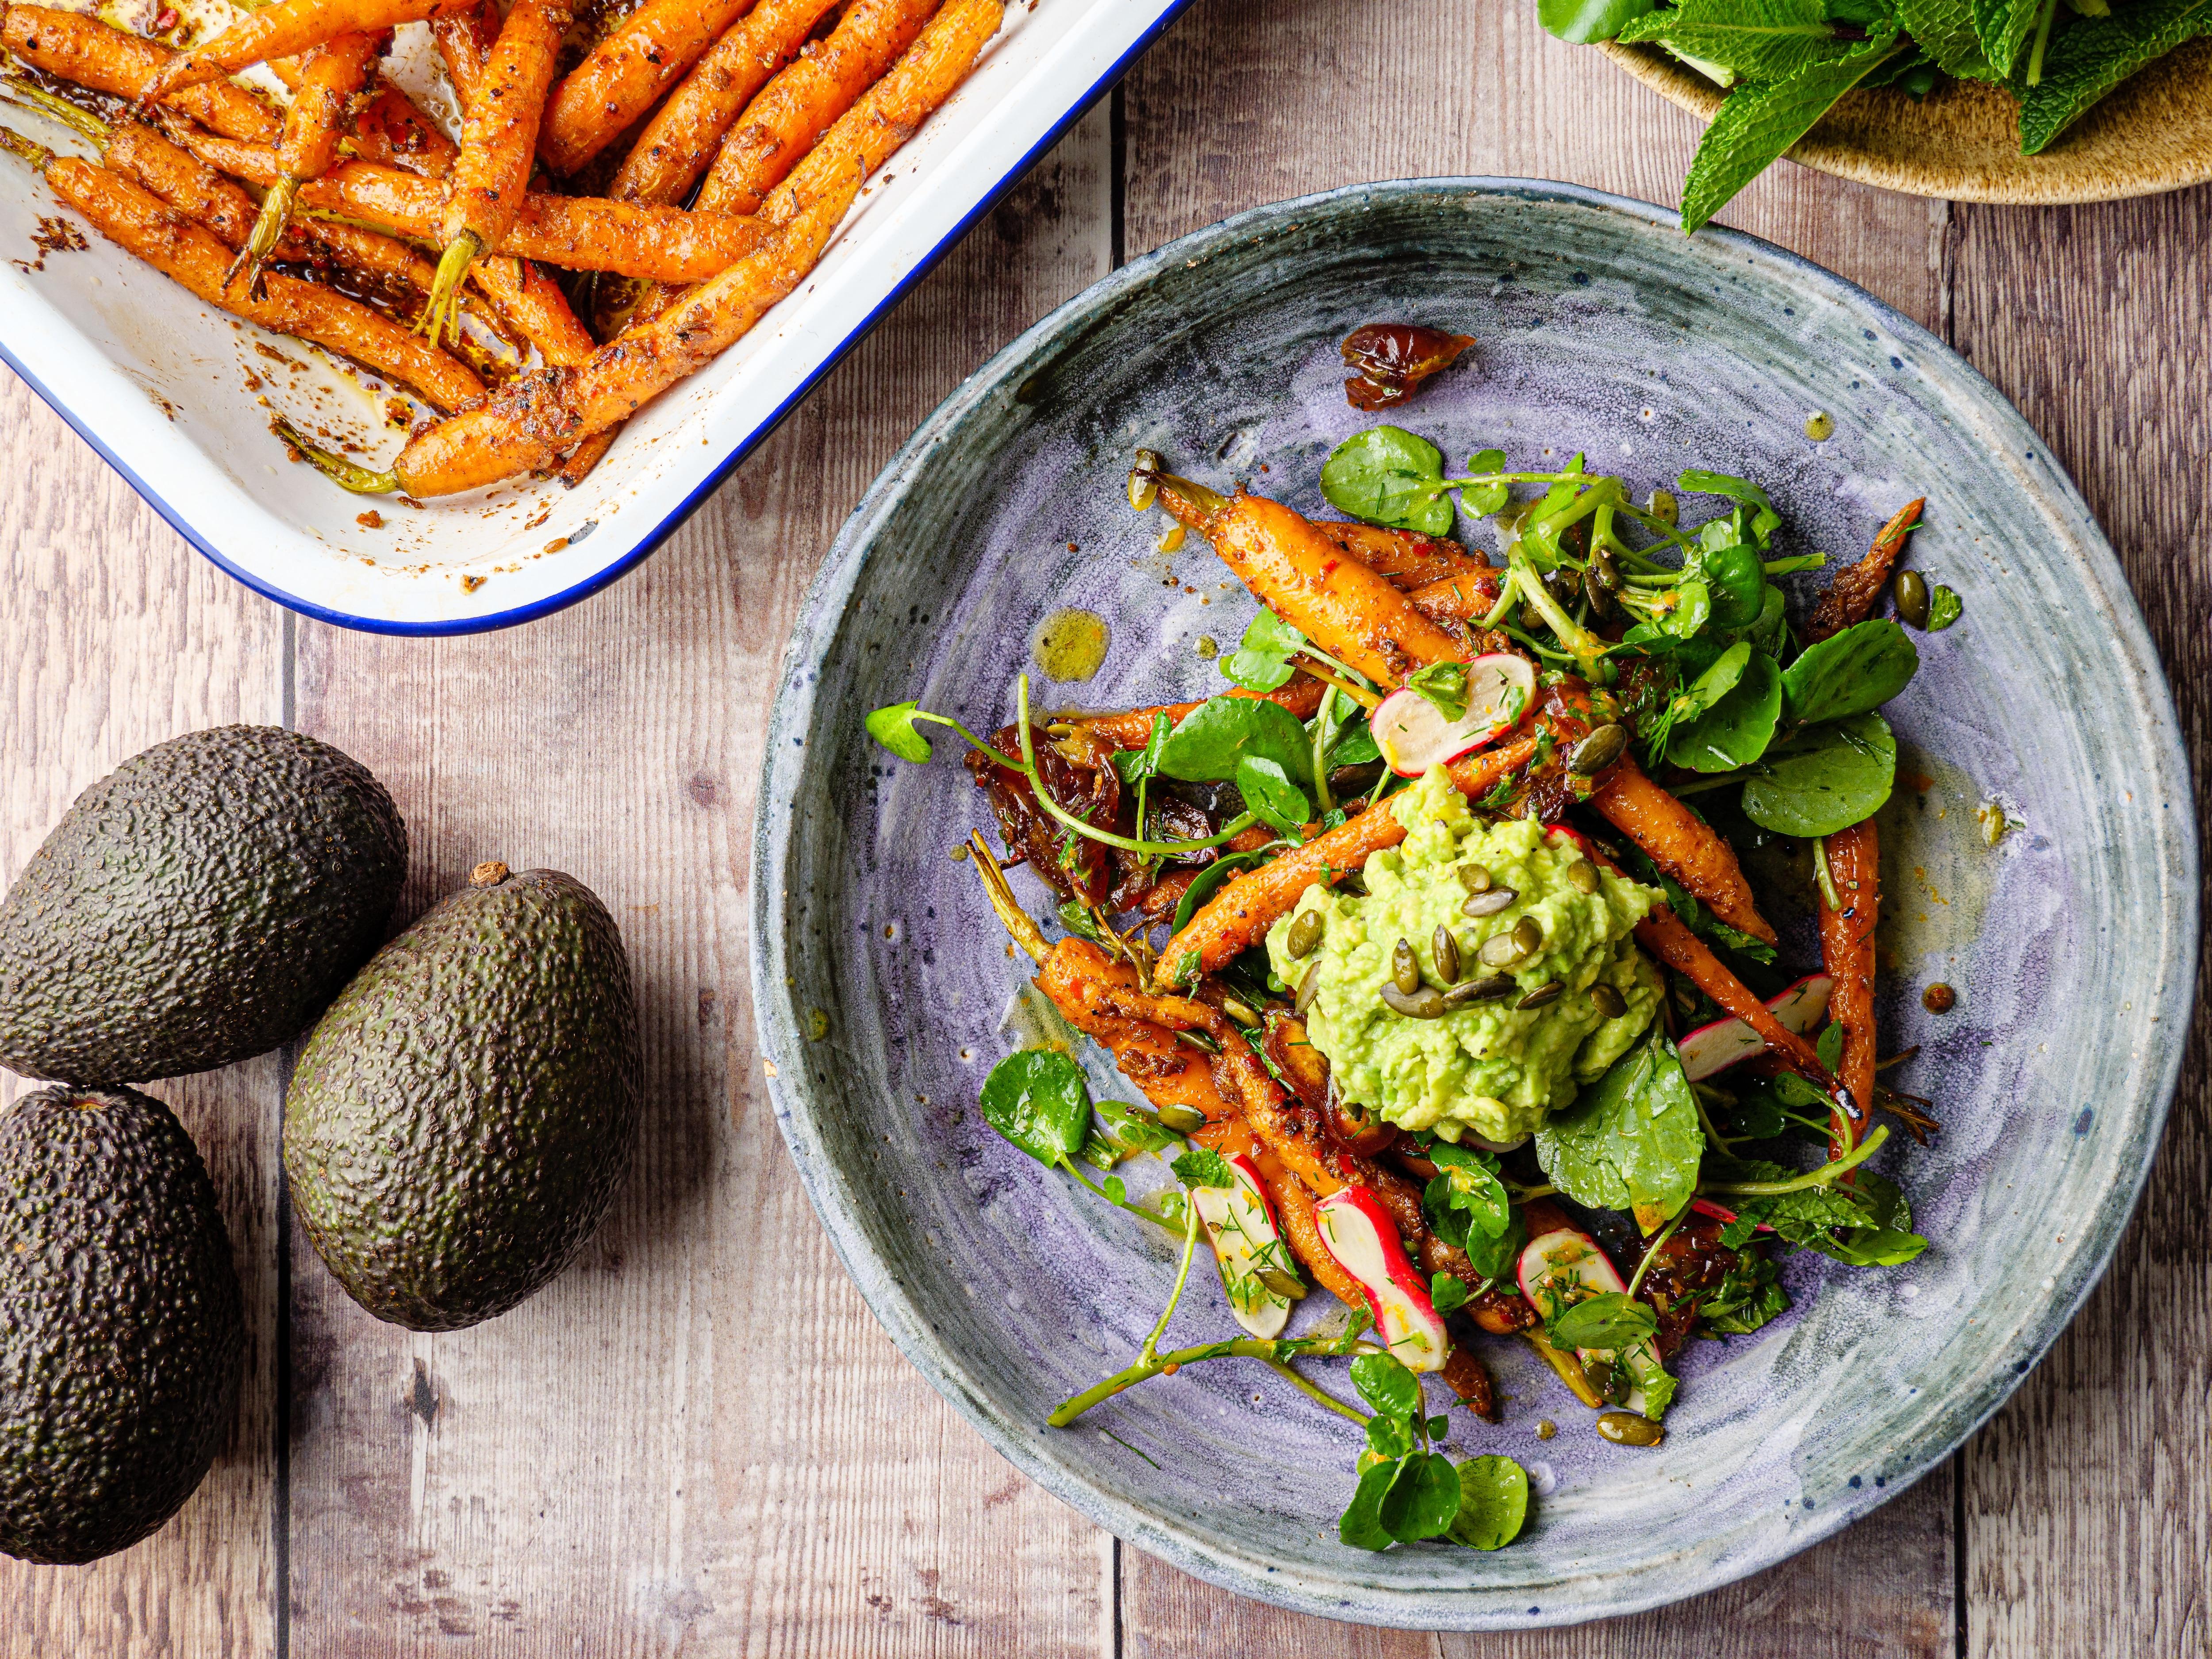 Carrot & Avocado Salad